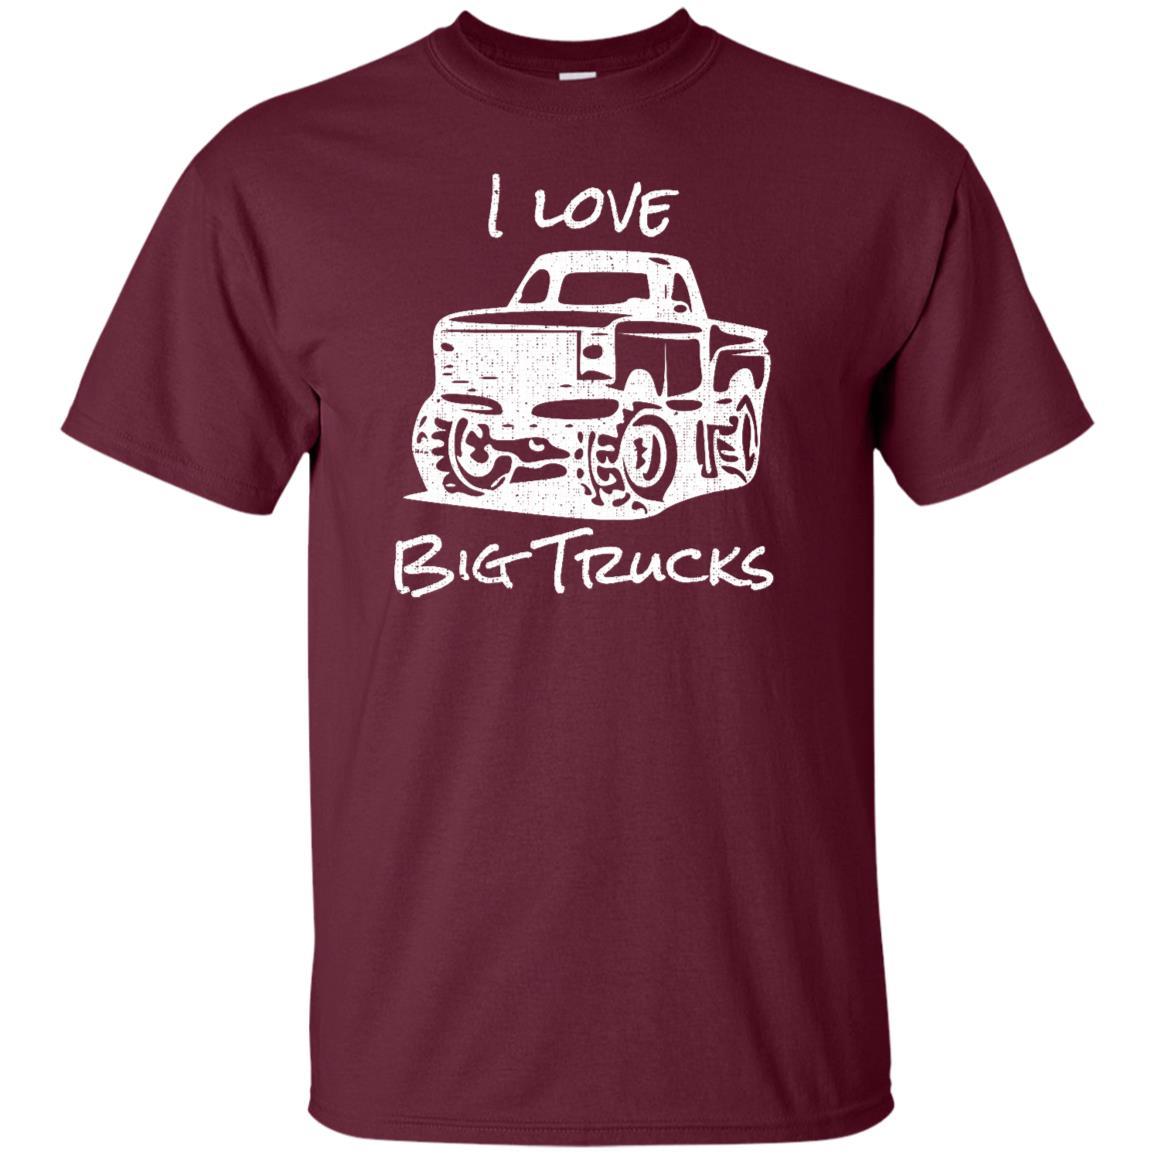 I Love Big Trucks Stomp races crush trucker Unisex Short Sleeve